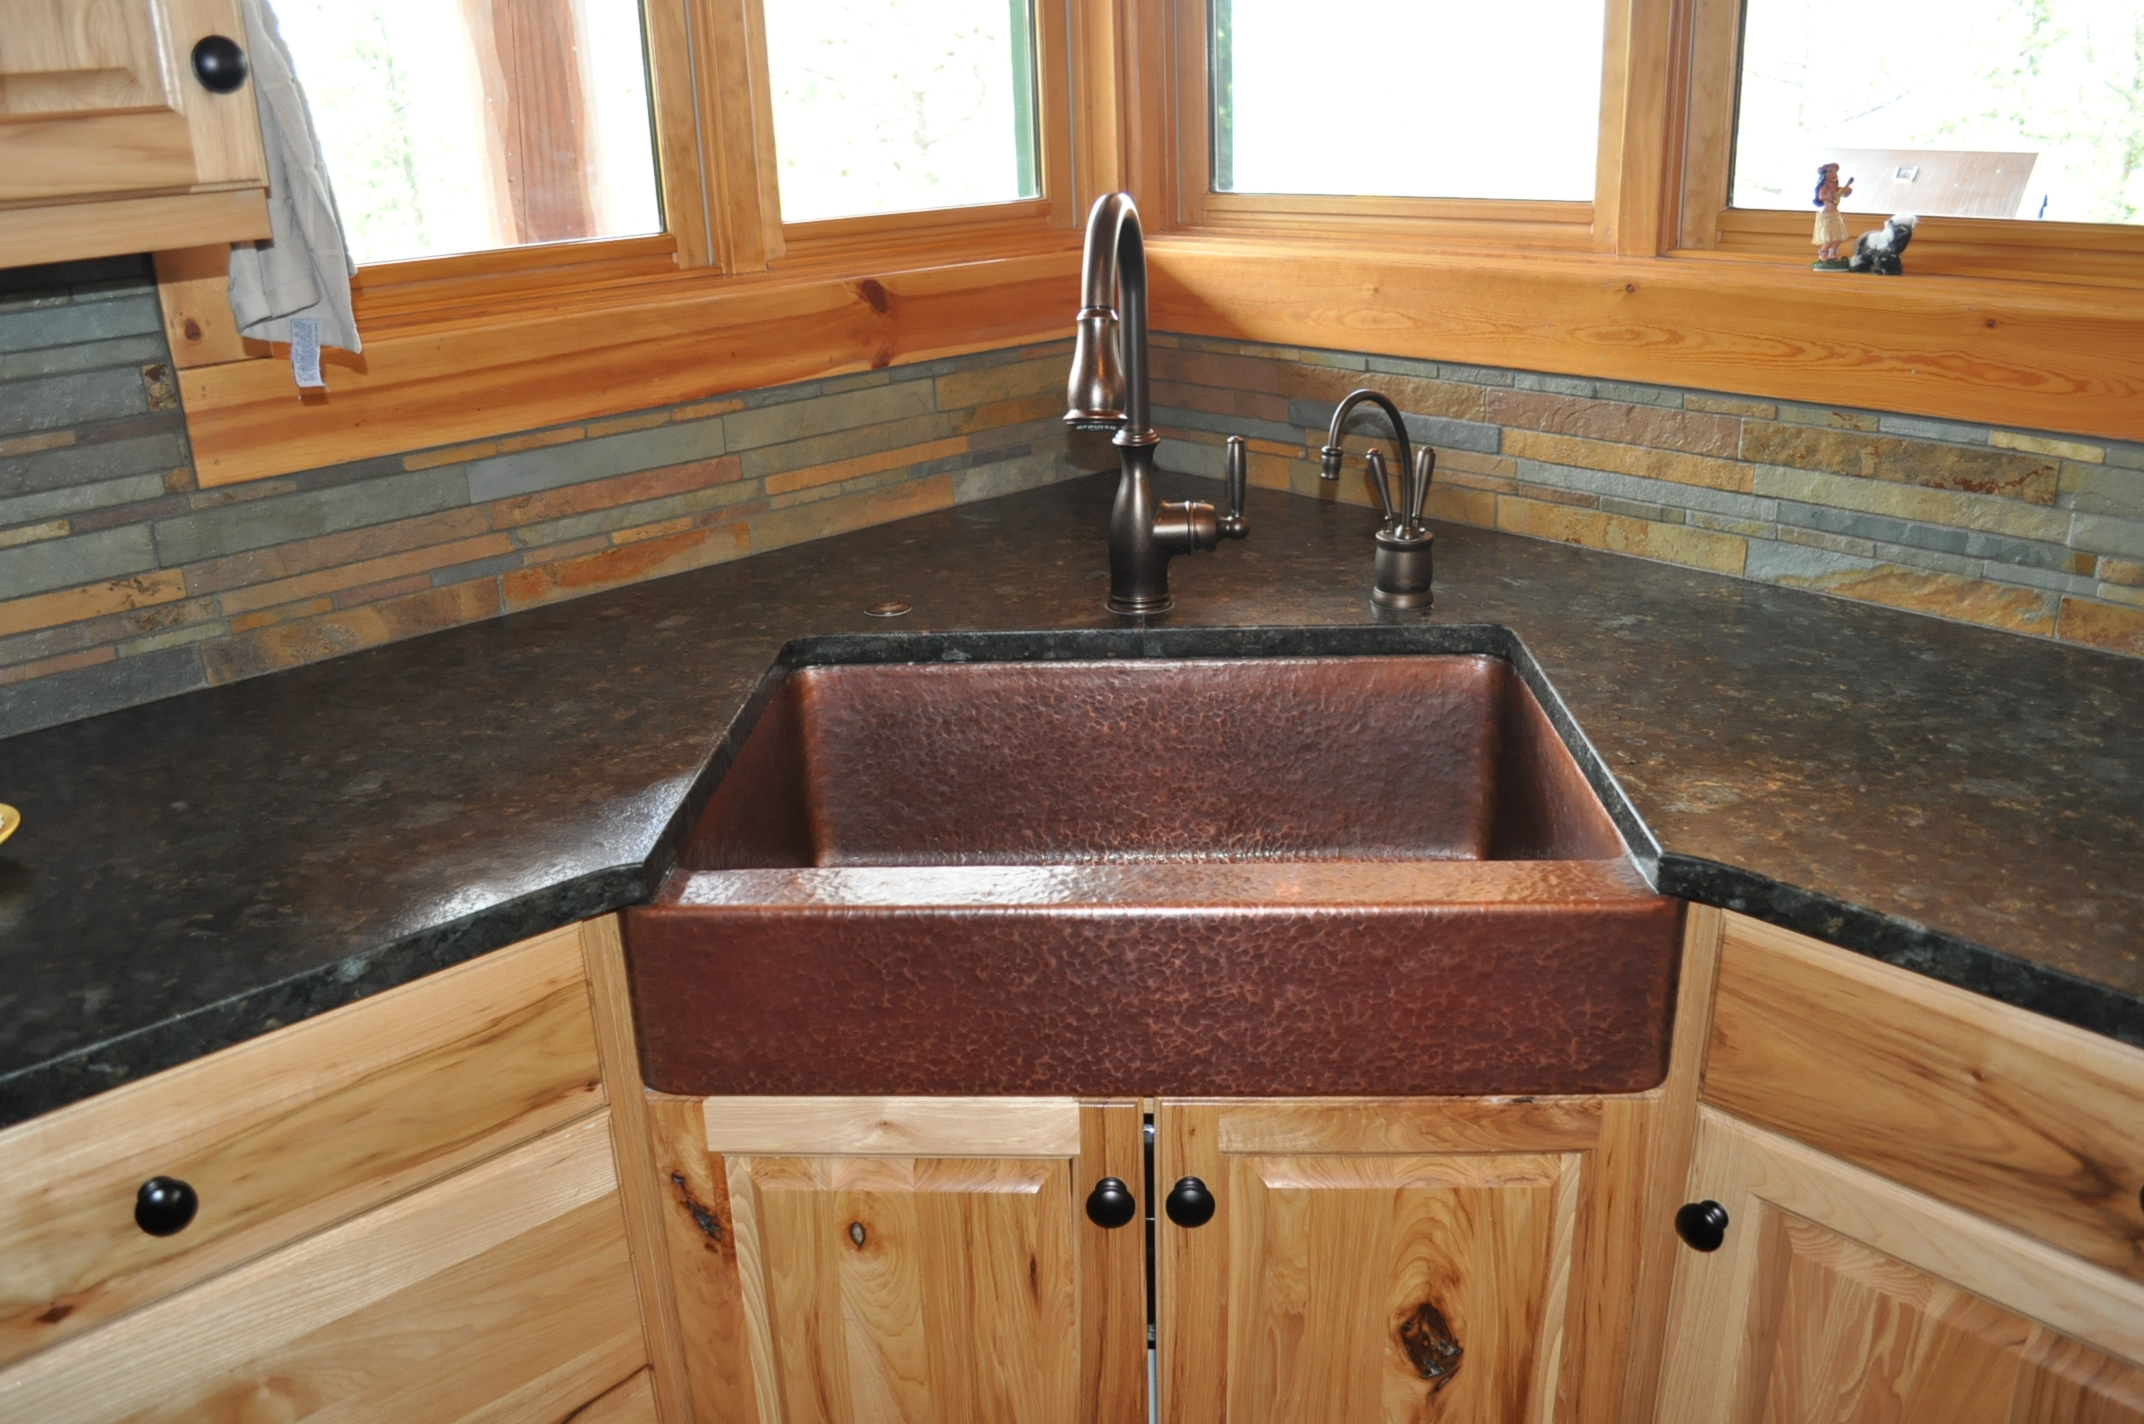 Rustic Cabin Kitchen Sinks